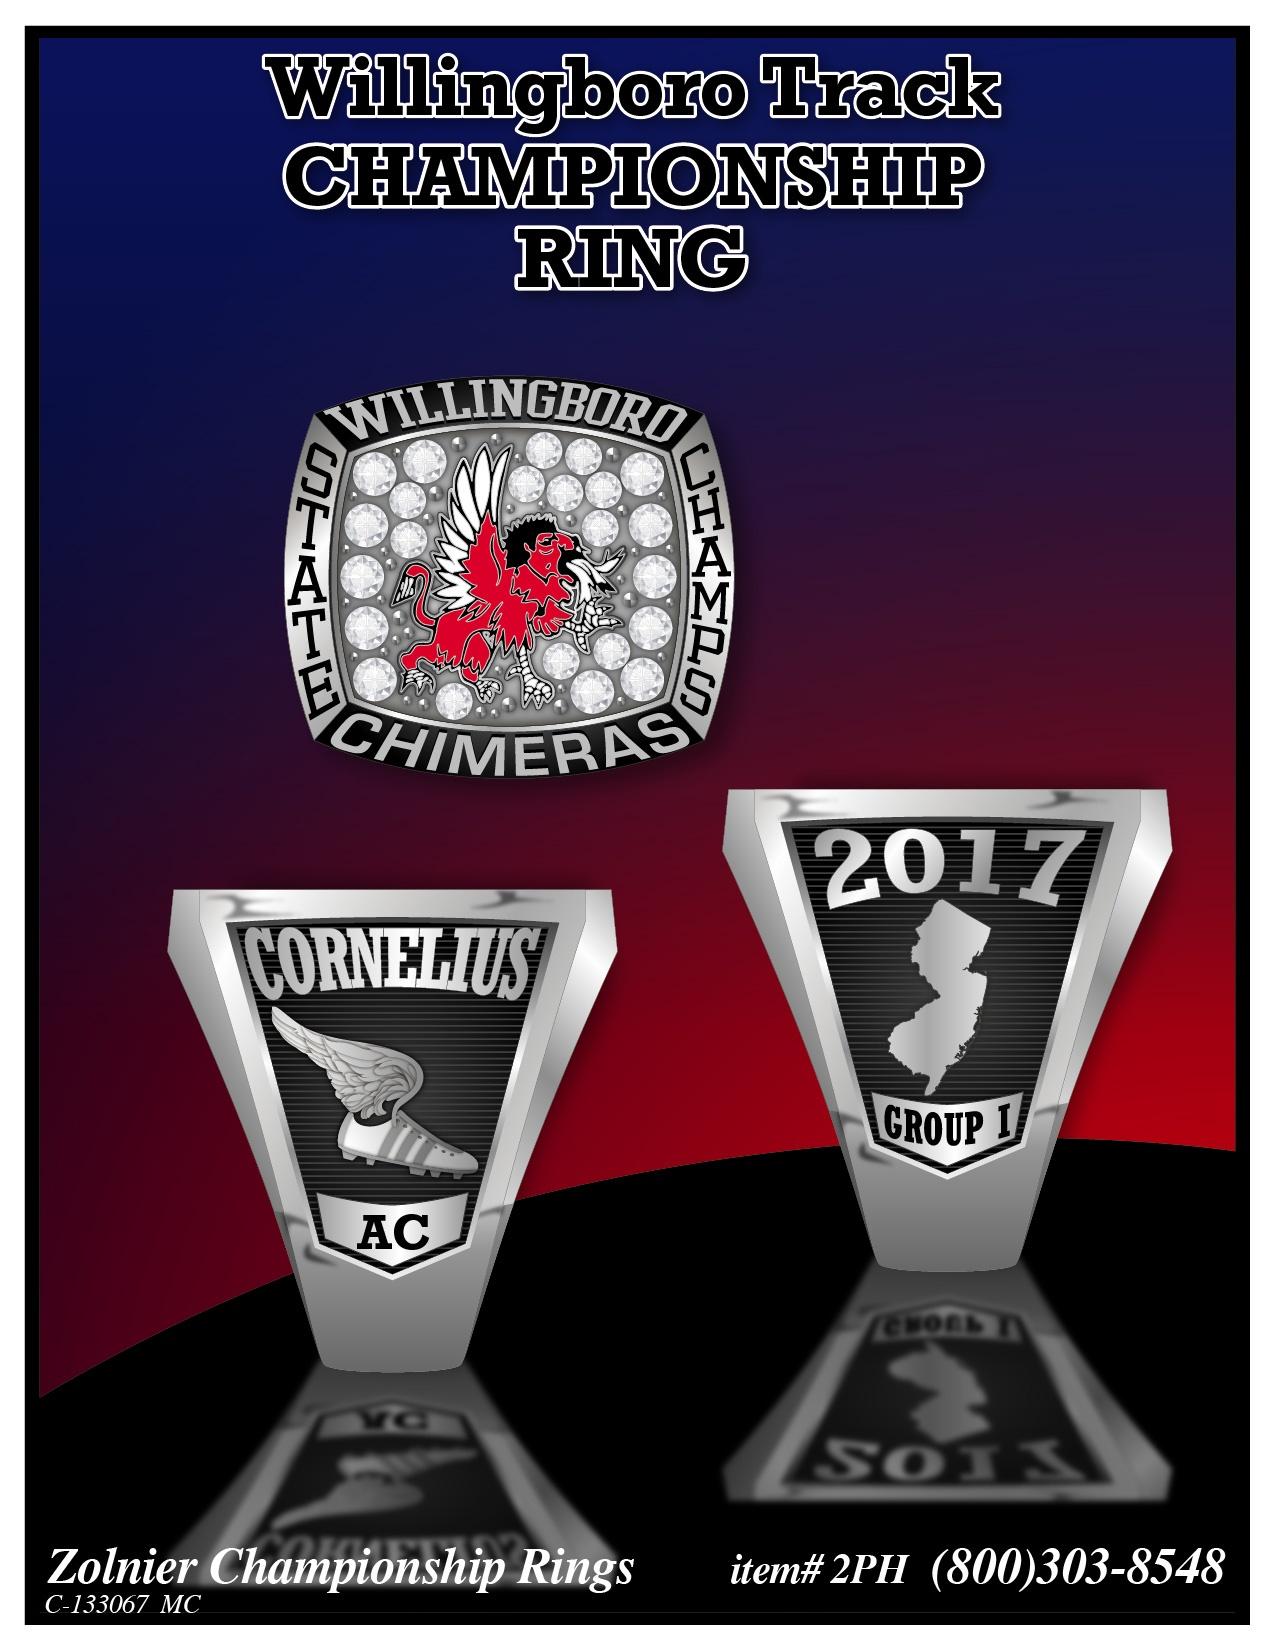 C-133067 Willingboro Track Championship Ring